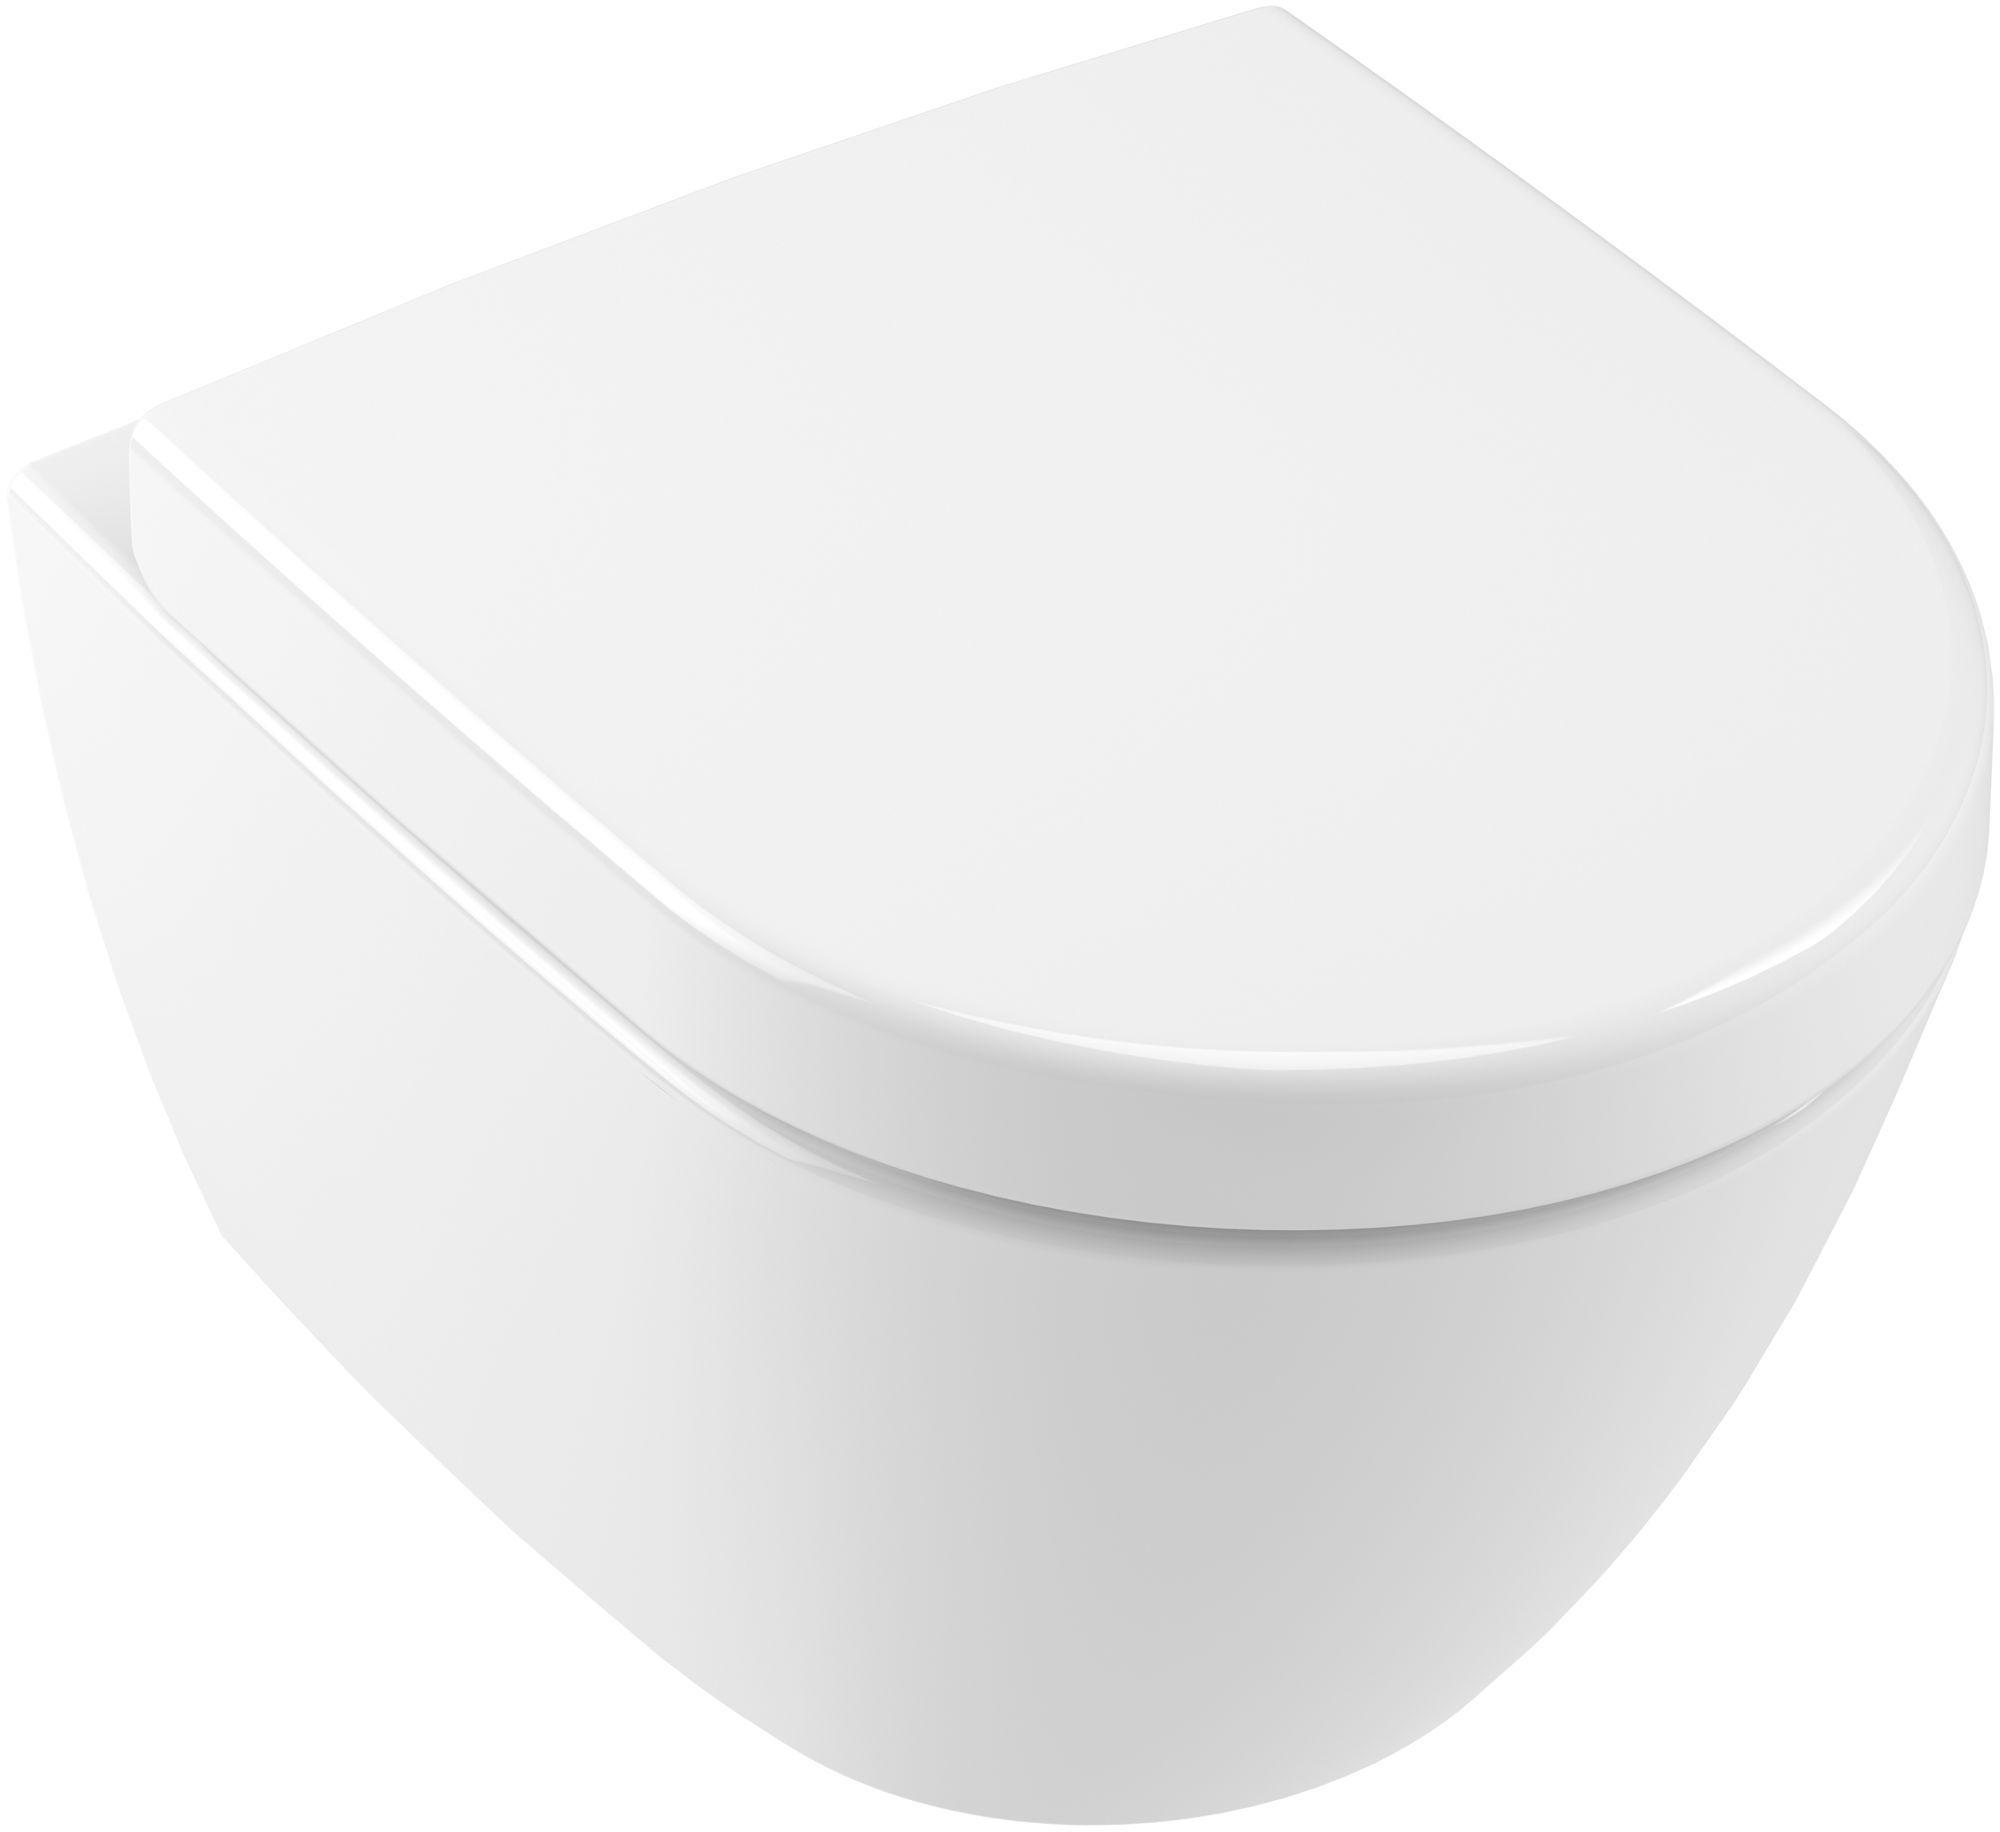 Villeroy & Boch Subway 2.0 Compact Tiefspül-Wand-WC L:48xB:35,5cm Star White mit Ceramicplus 560610R2